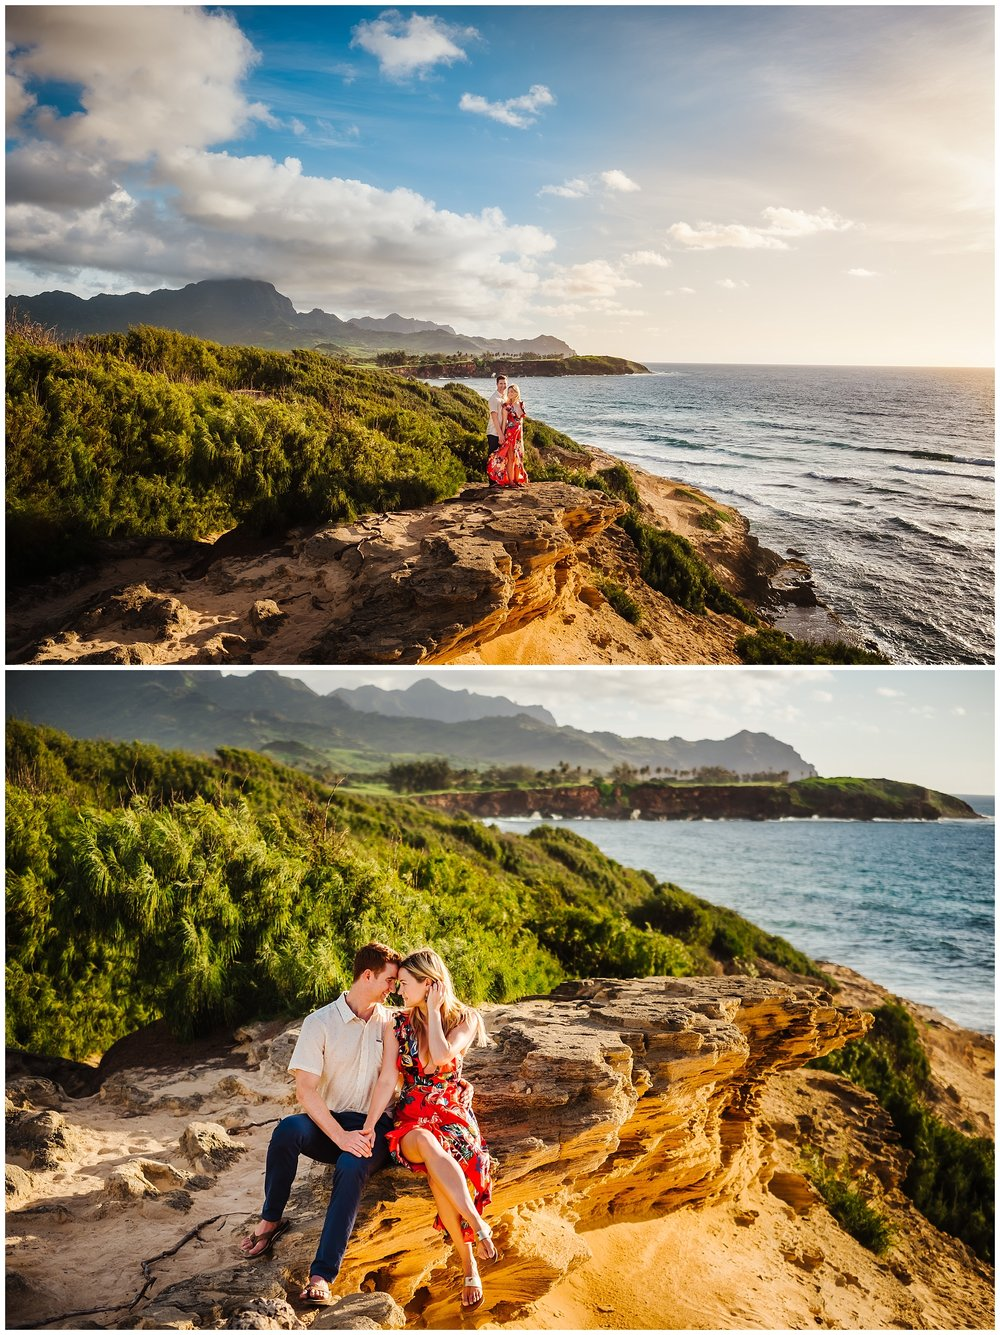 hawaiin-honeymoon-sunrise-portraits-kauai-grand-hystt-destination-photographer_0015.jpg